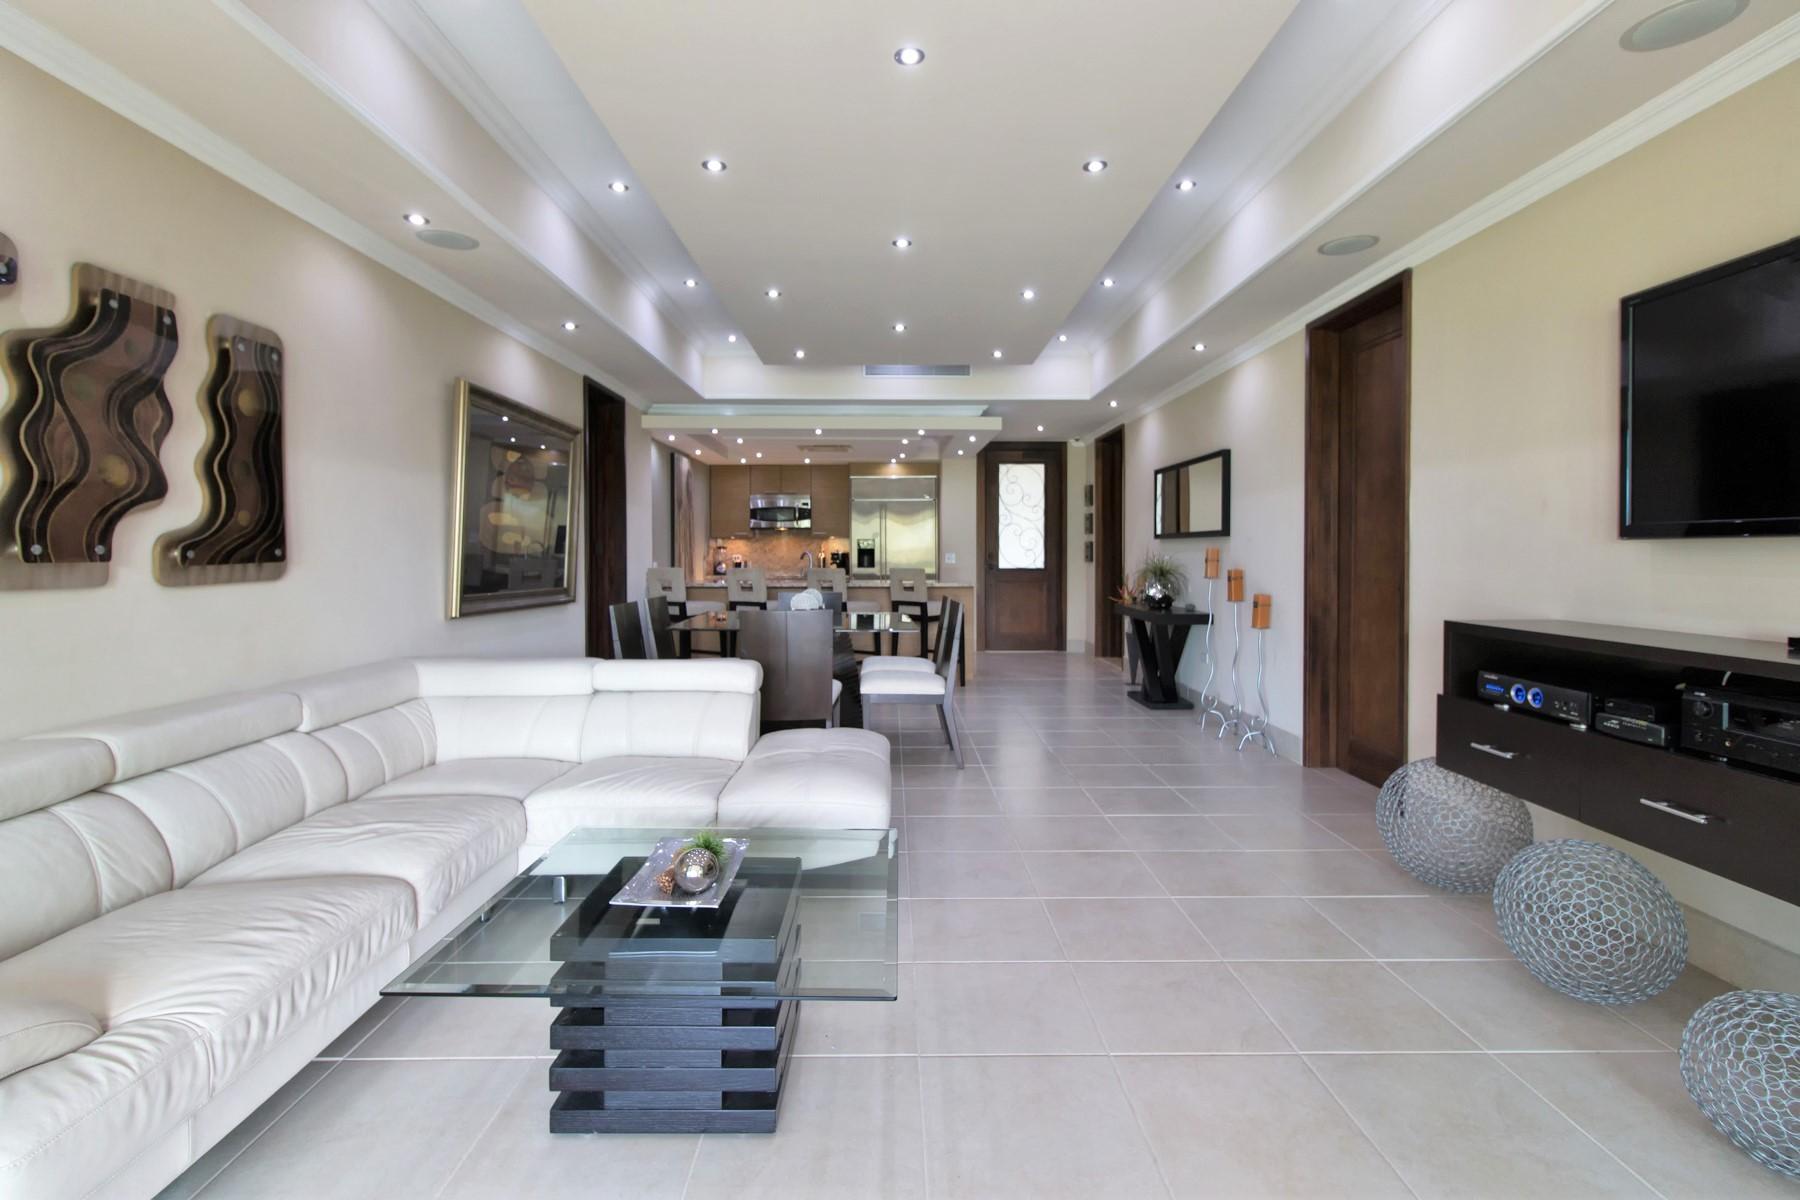 Additional photo for property listing at Ground Level Villa at Las Verandas 10182 Las Verandas State Road 187, Km. 4.2 St Regis, Bahia Beach Bahia Beach, 波多黎各 00745 波多黎各